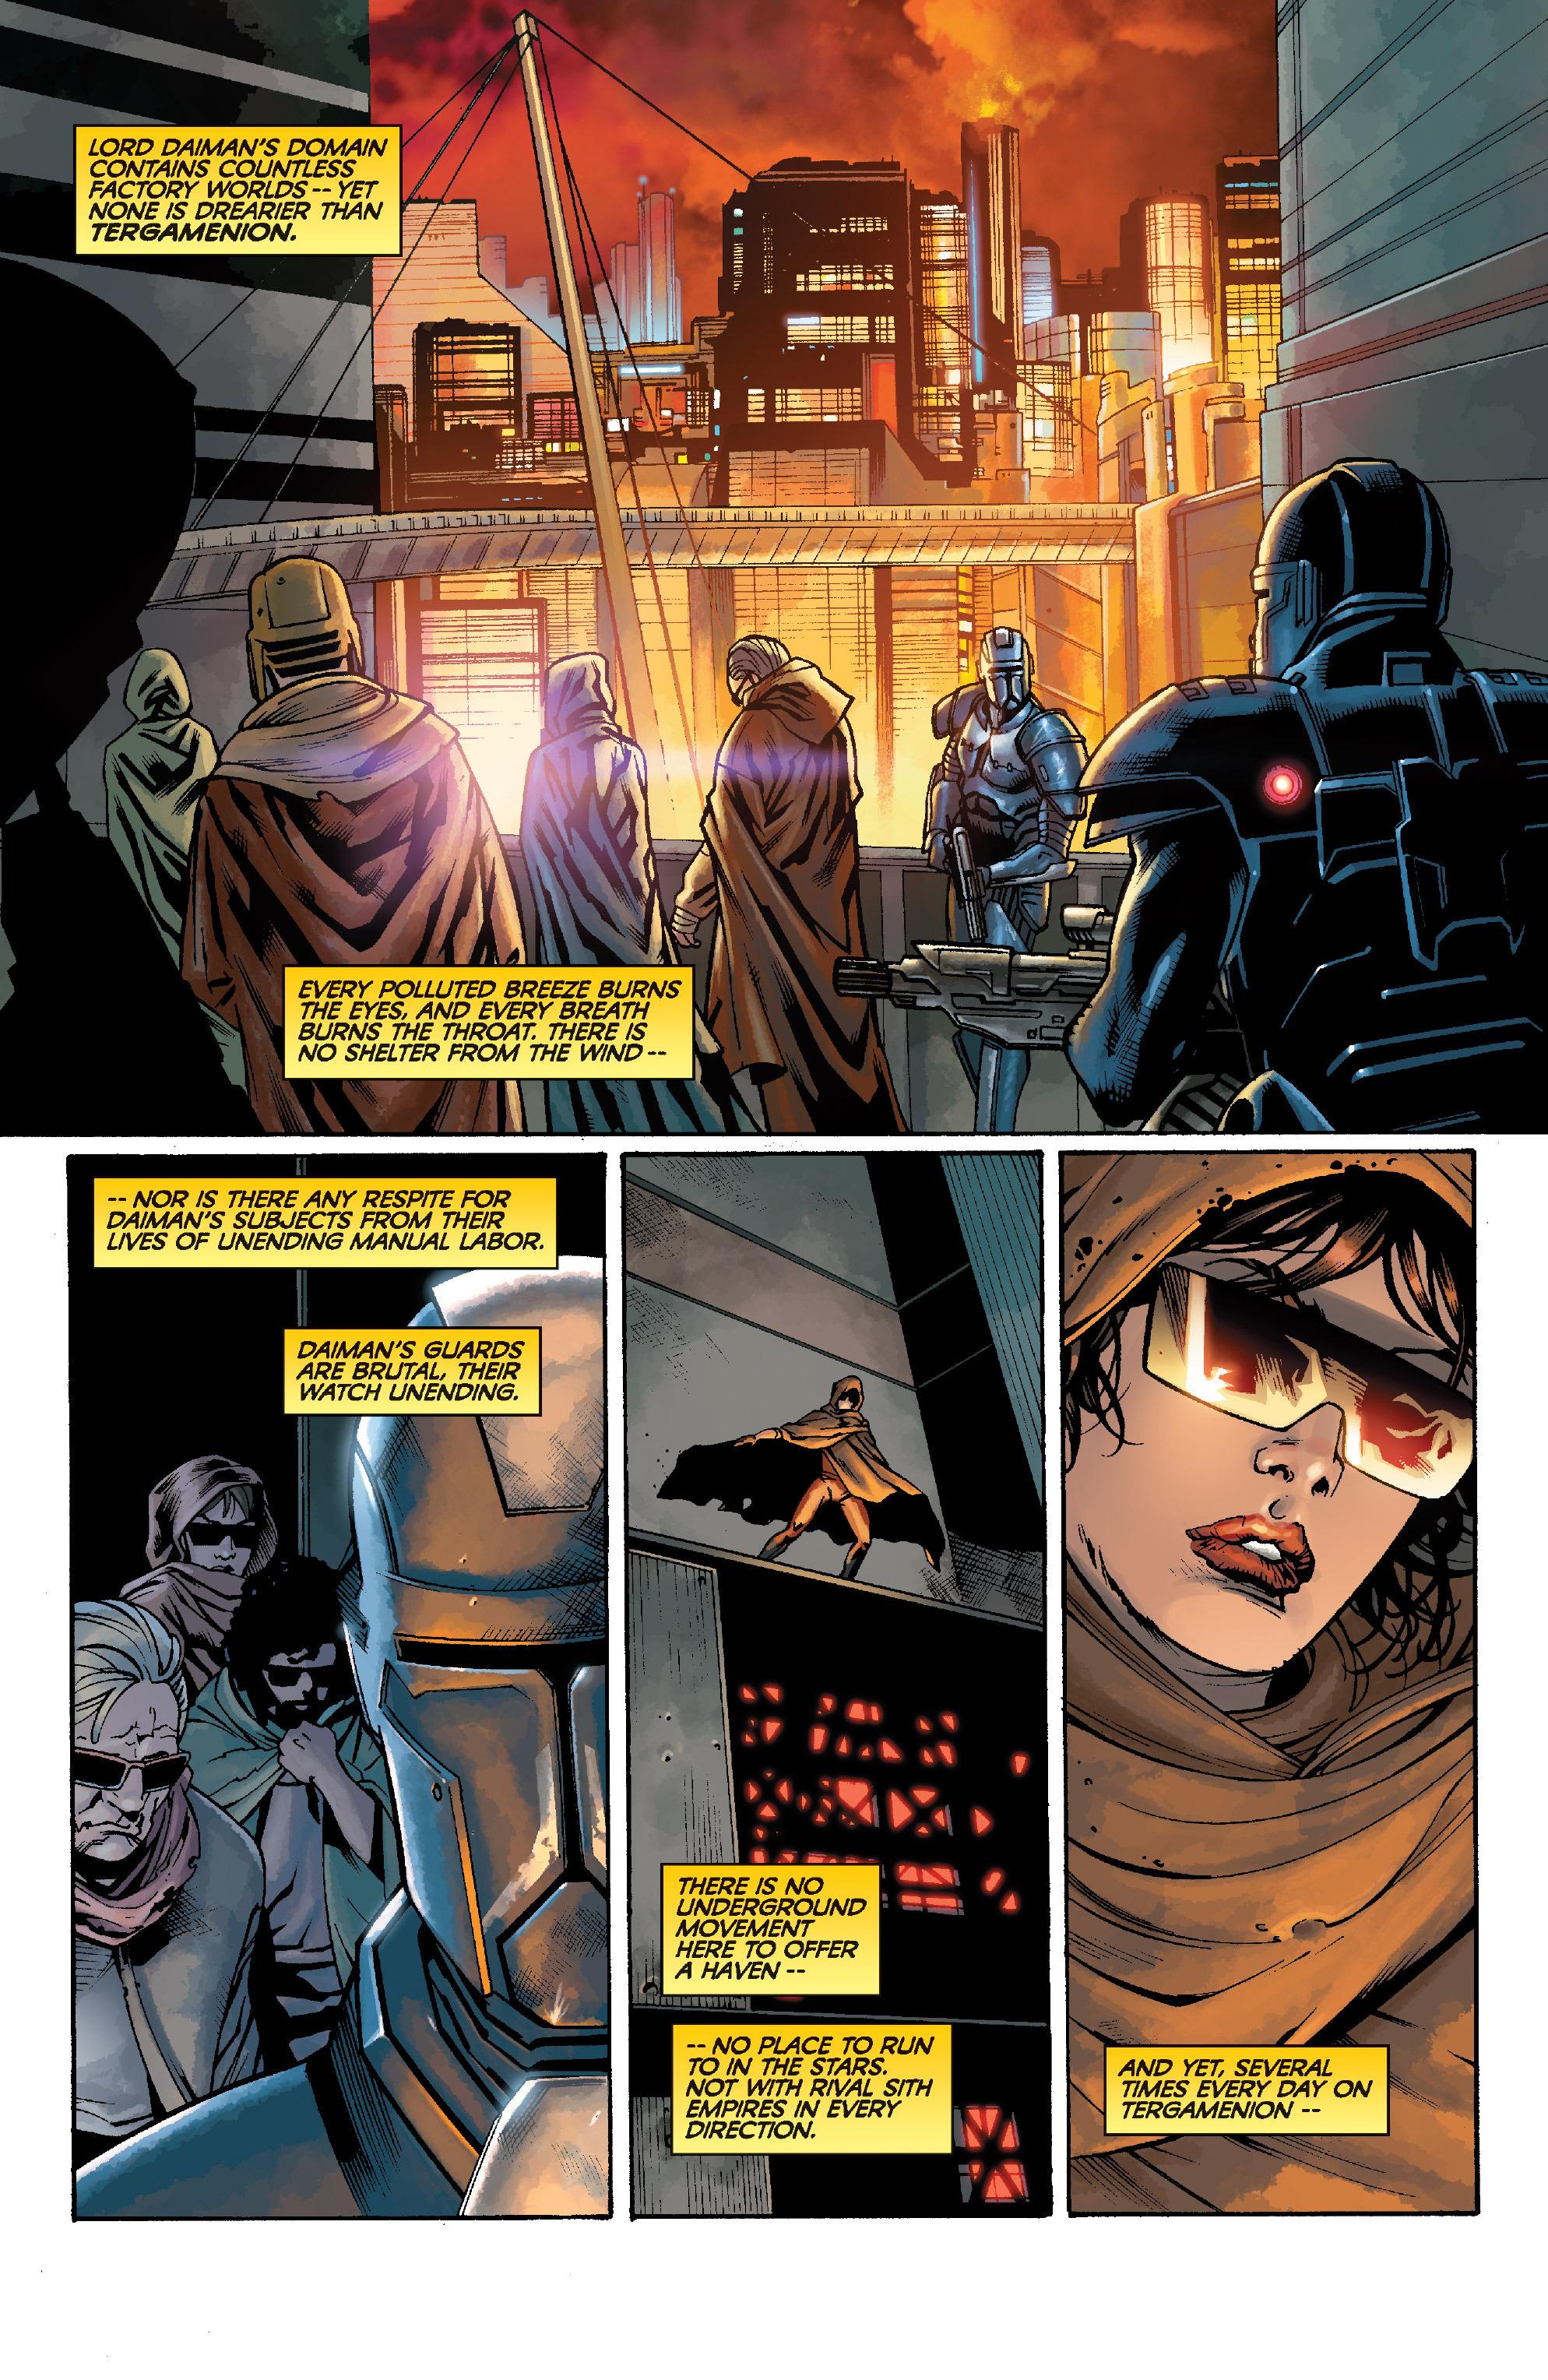 Read online Star Wars: Knight Errant - Escape comic -  Issue #1 - 3